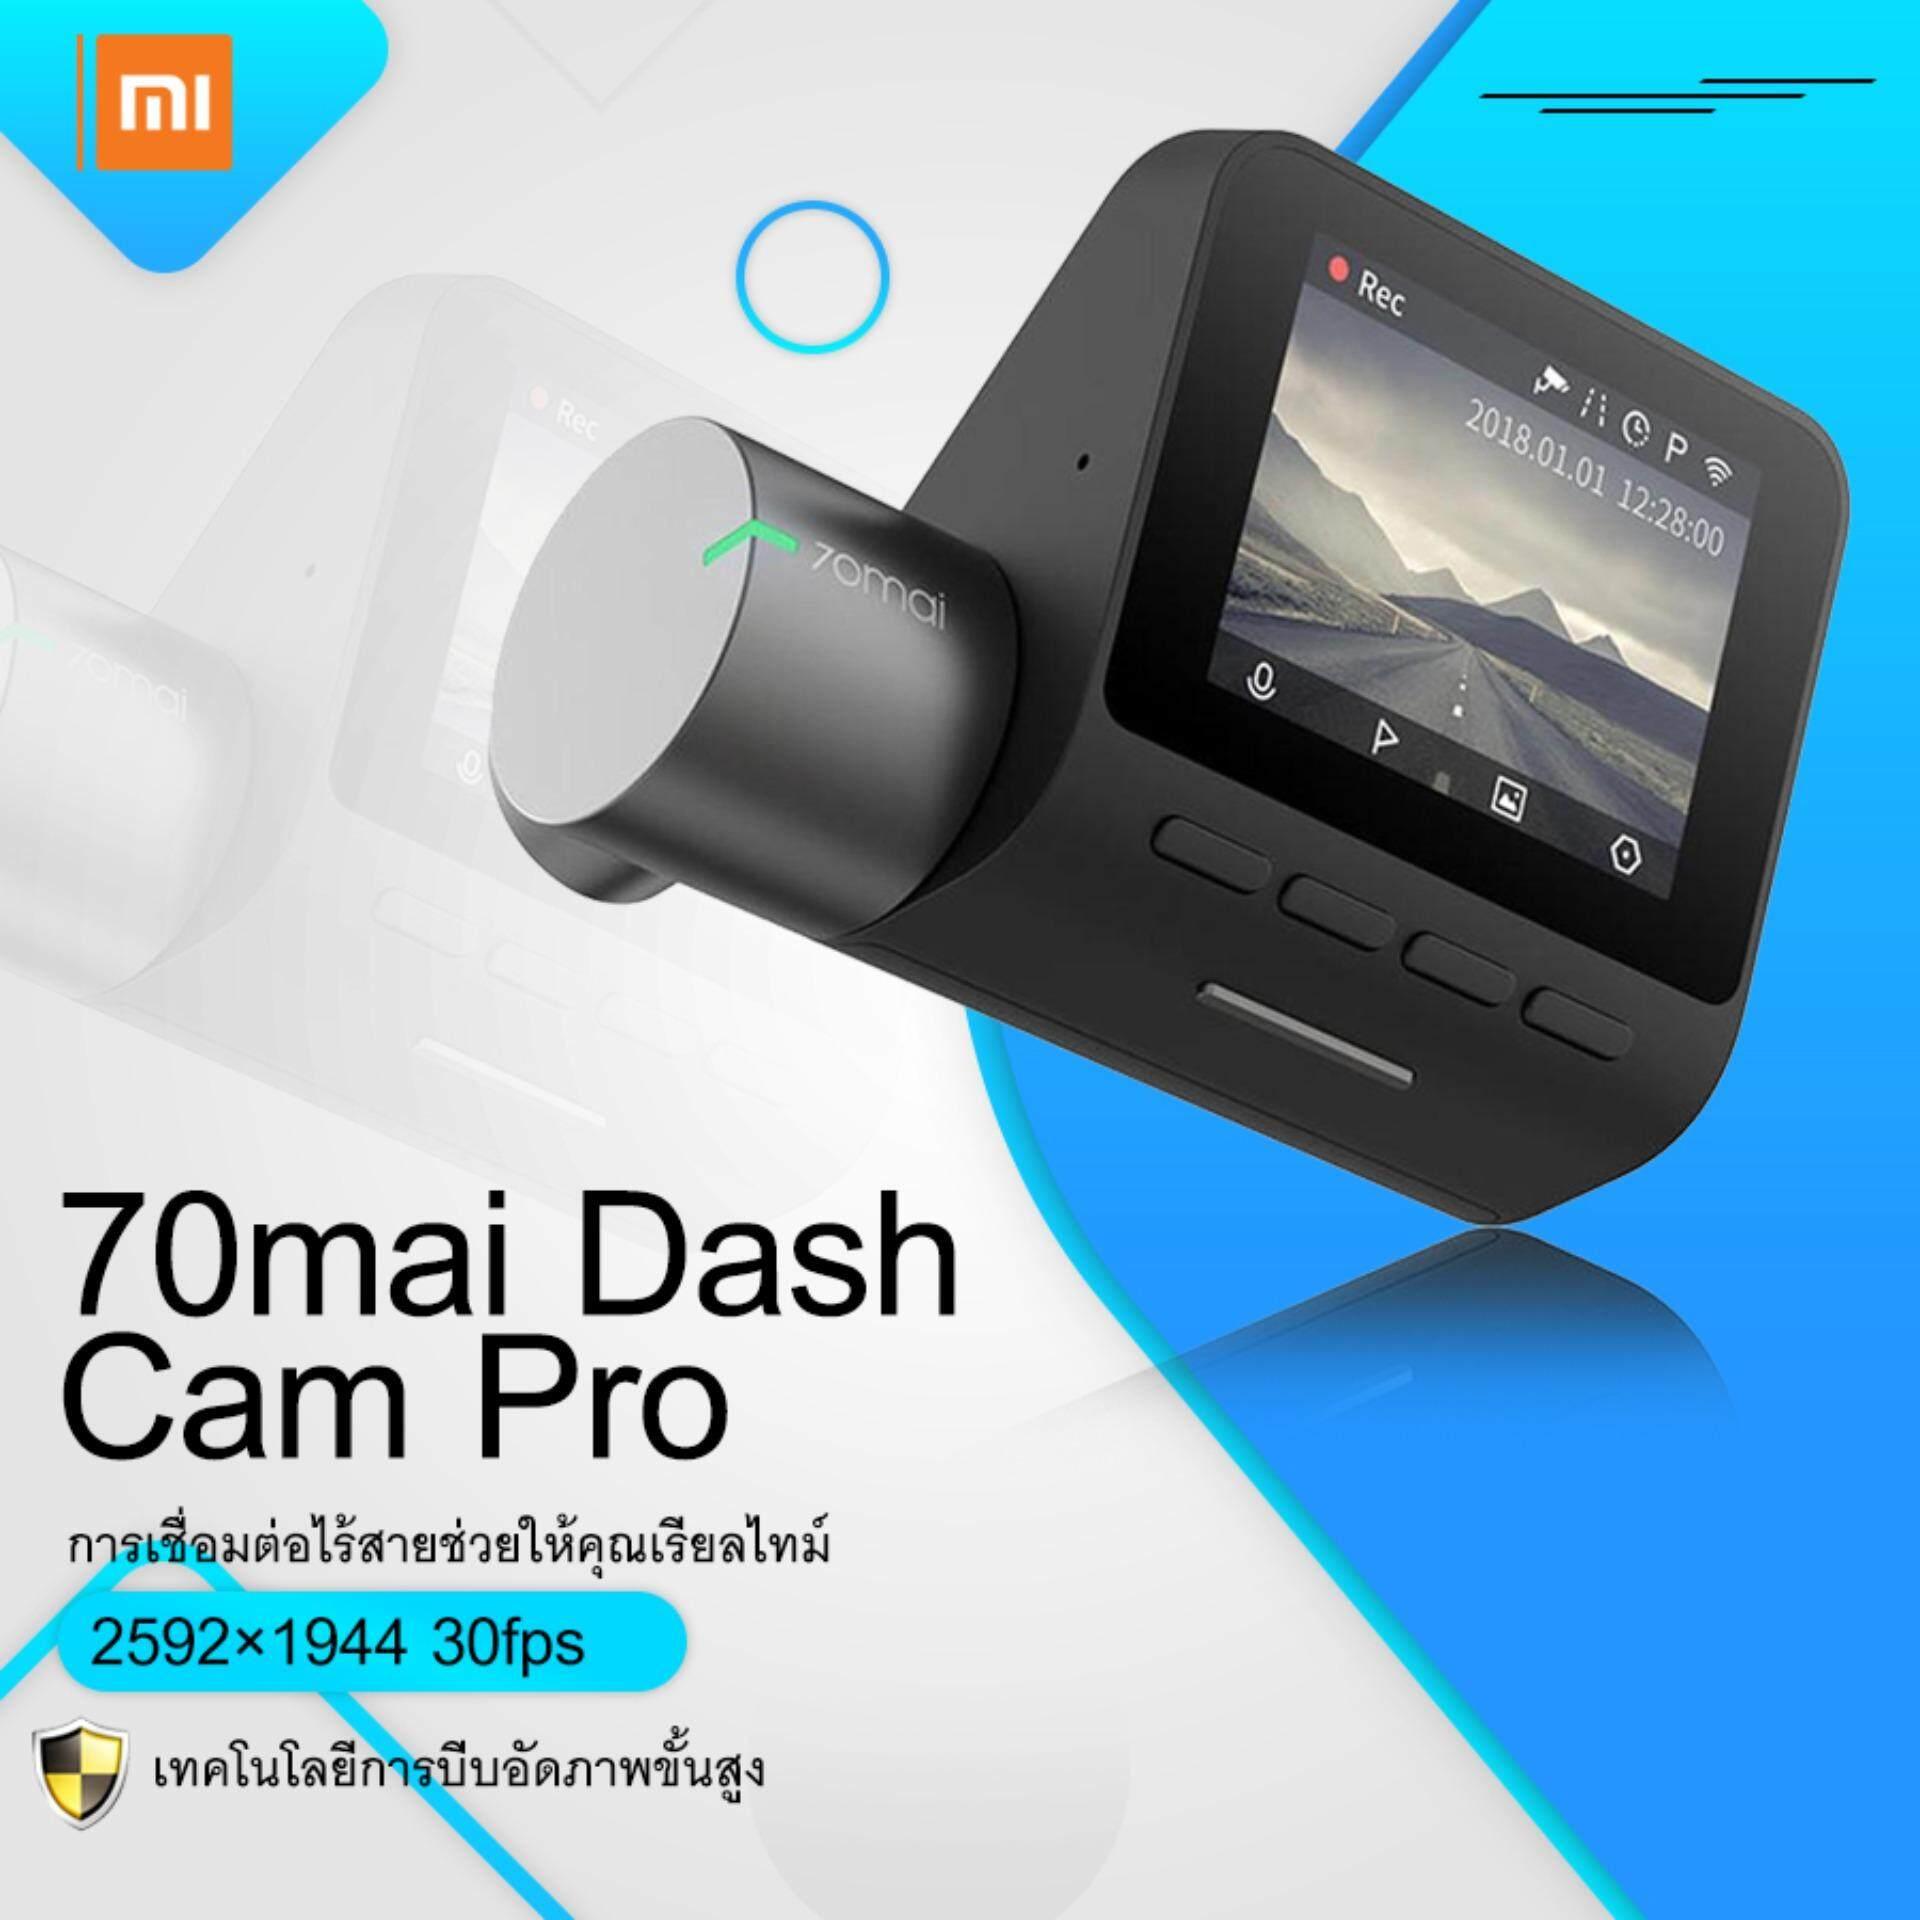 Xiaomi 70Mai Dash Cam Pro กล้องติดรถยนต์ 1944p HD Global Version รับประกัน 1 ปี